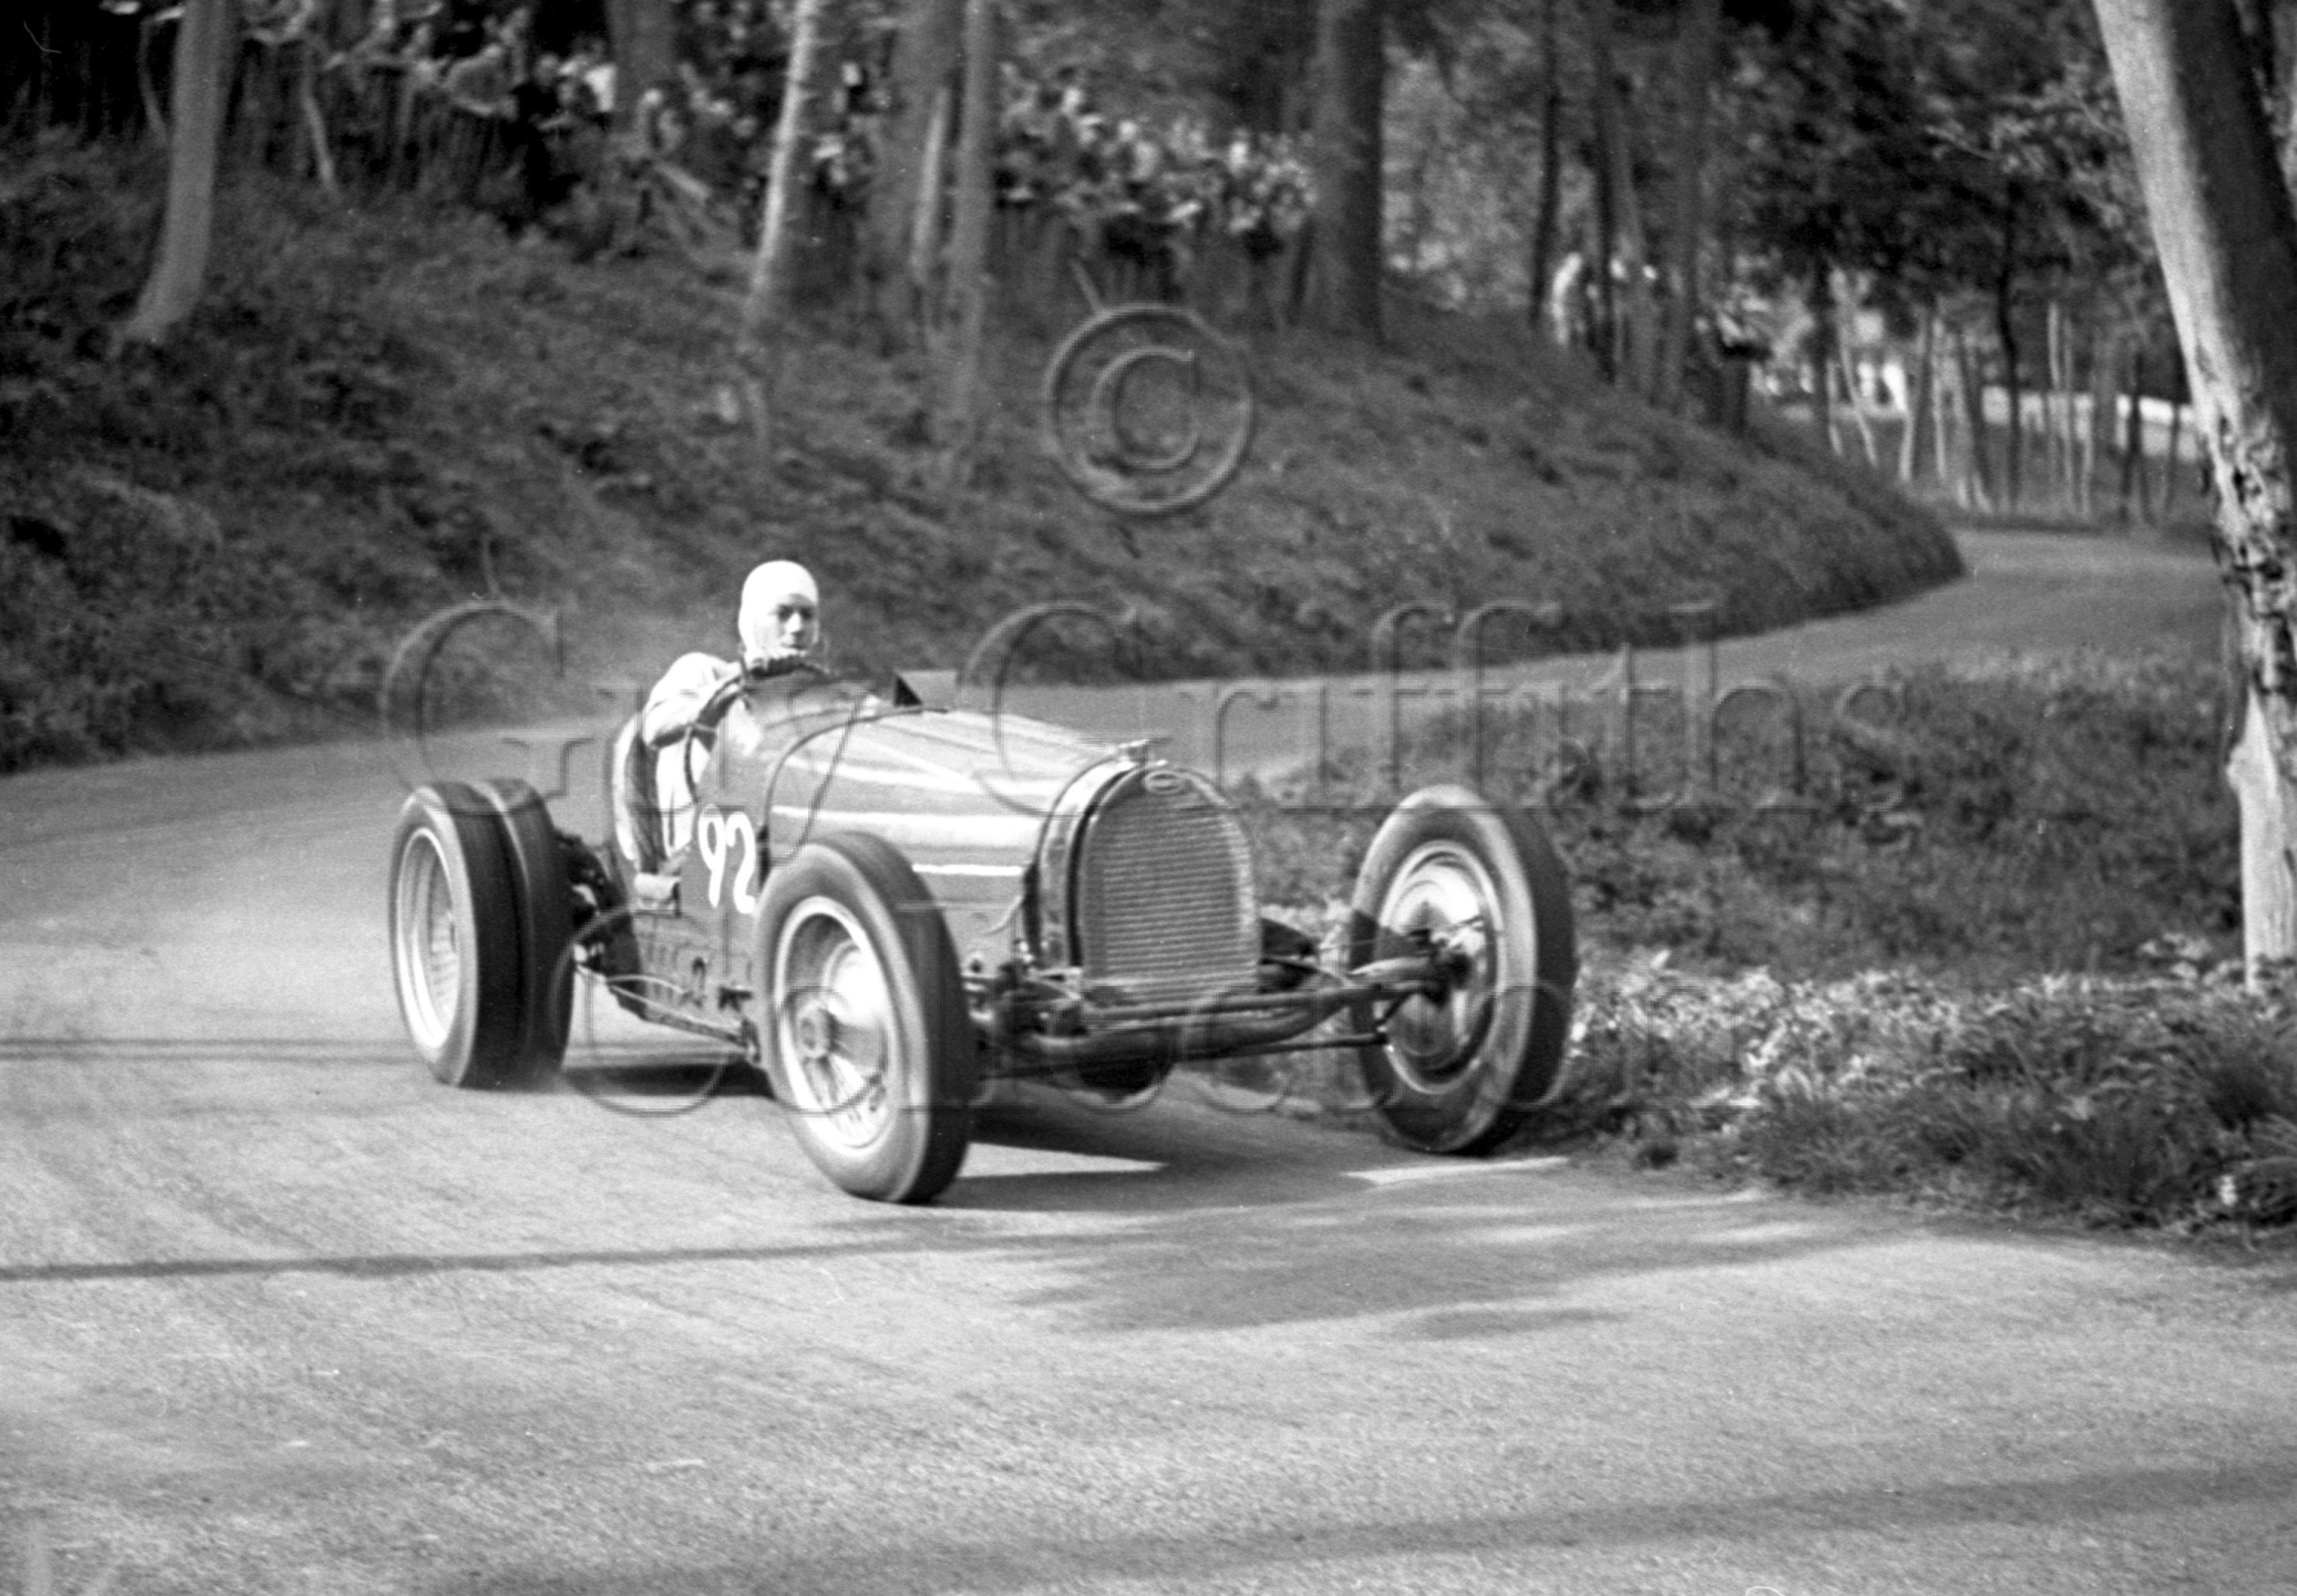 03-723–G-Abecassis–Bugatti–Prescott–11-05-1947.jpg - The Guy Griffiths Collection